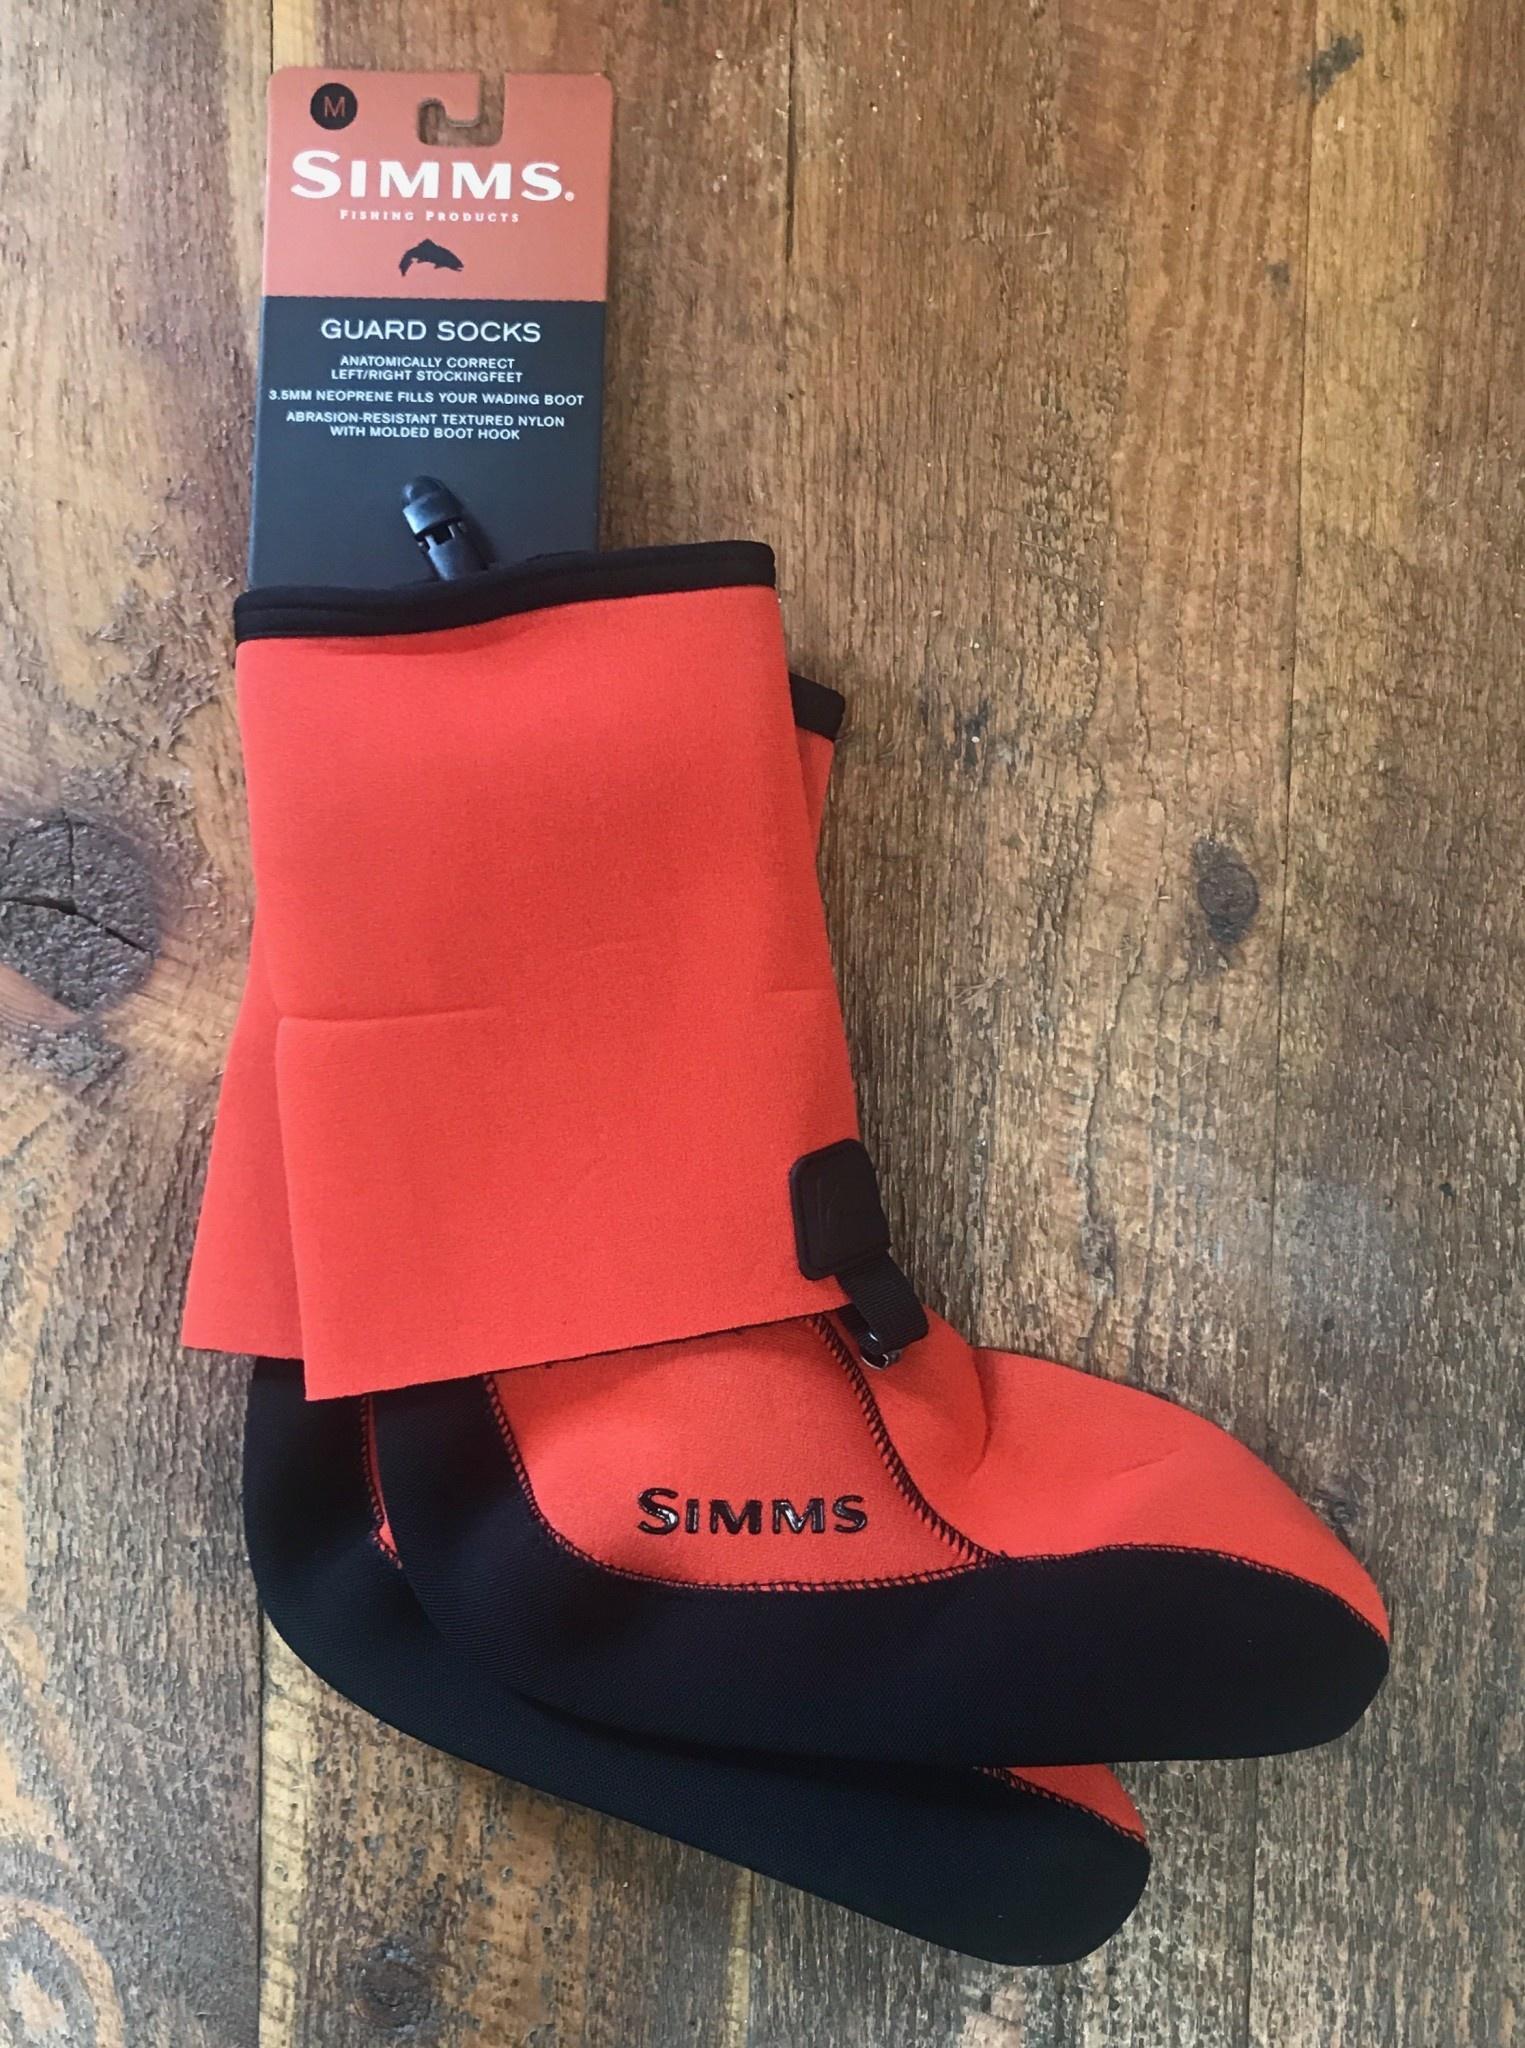 Simms Guard Socks Fury Orange Medium 50% Off